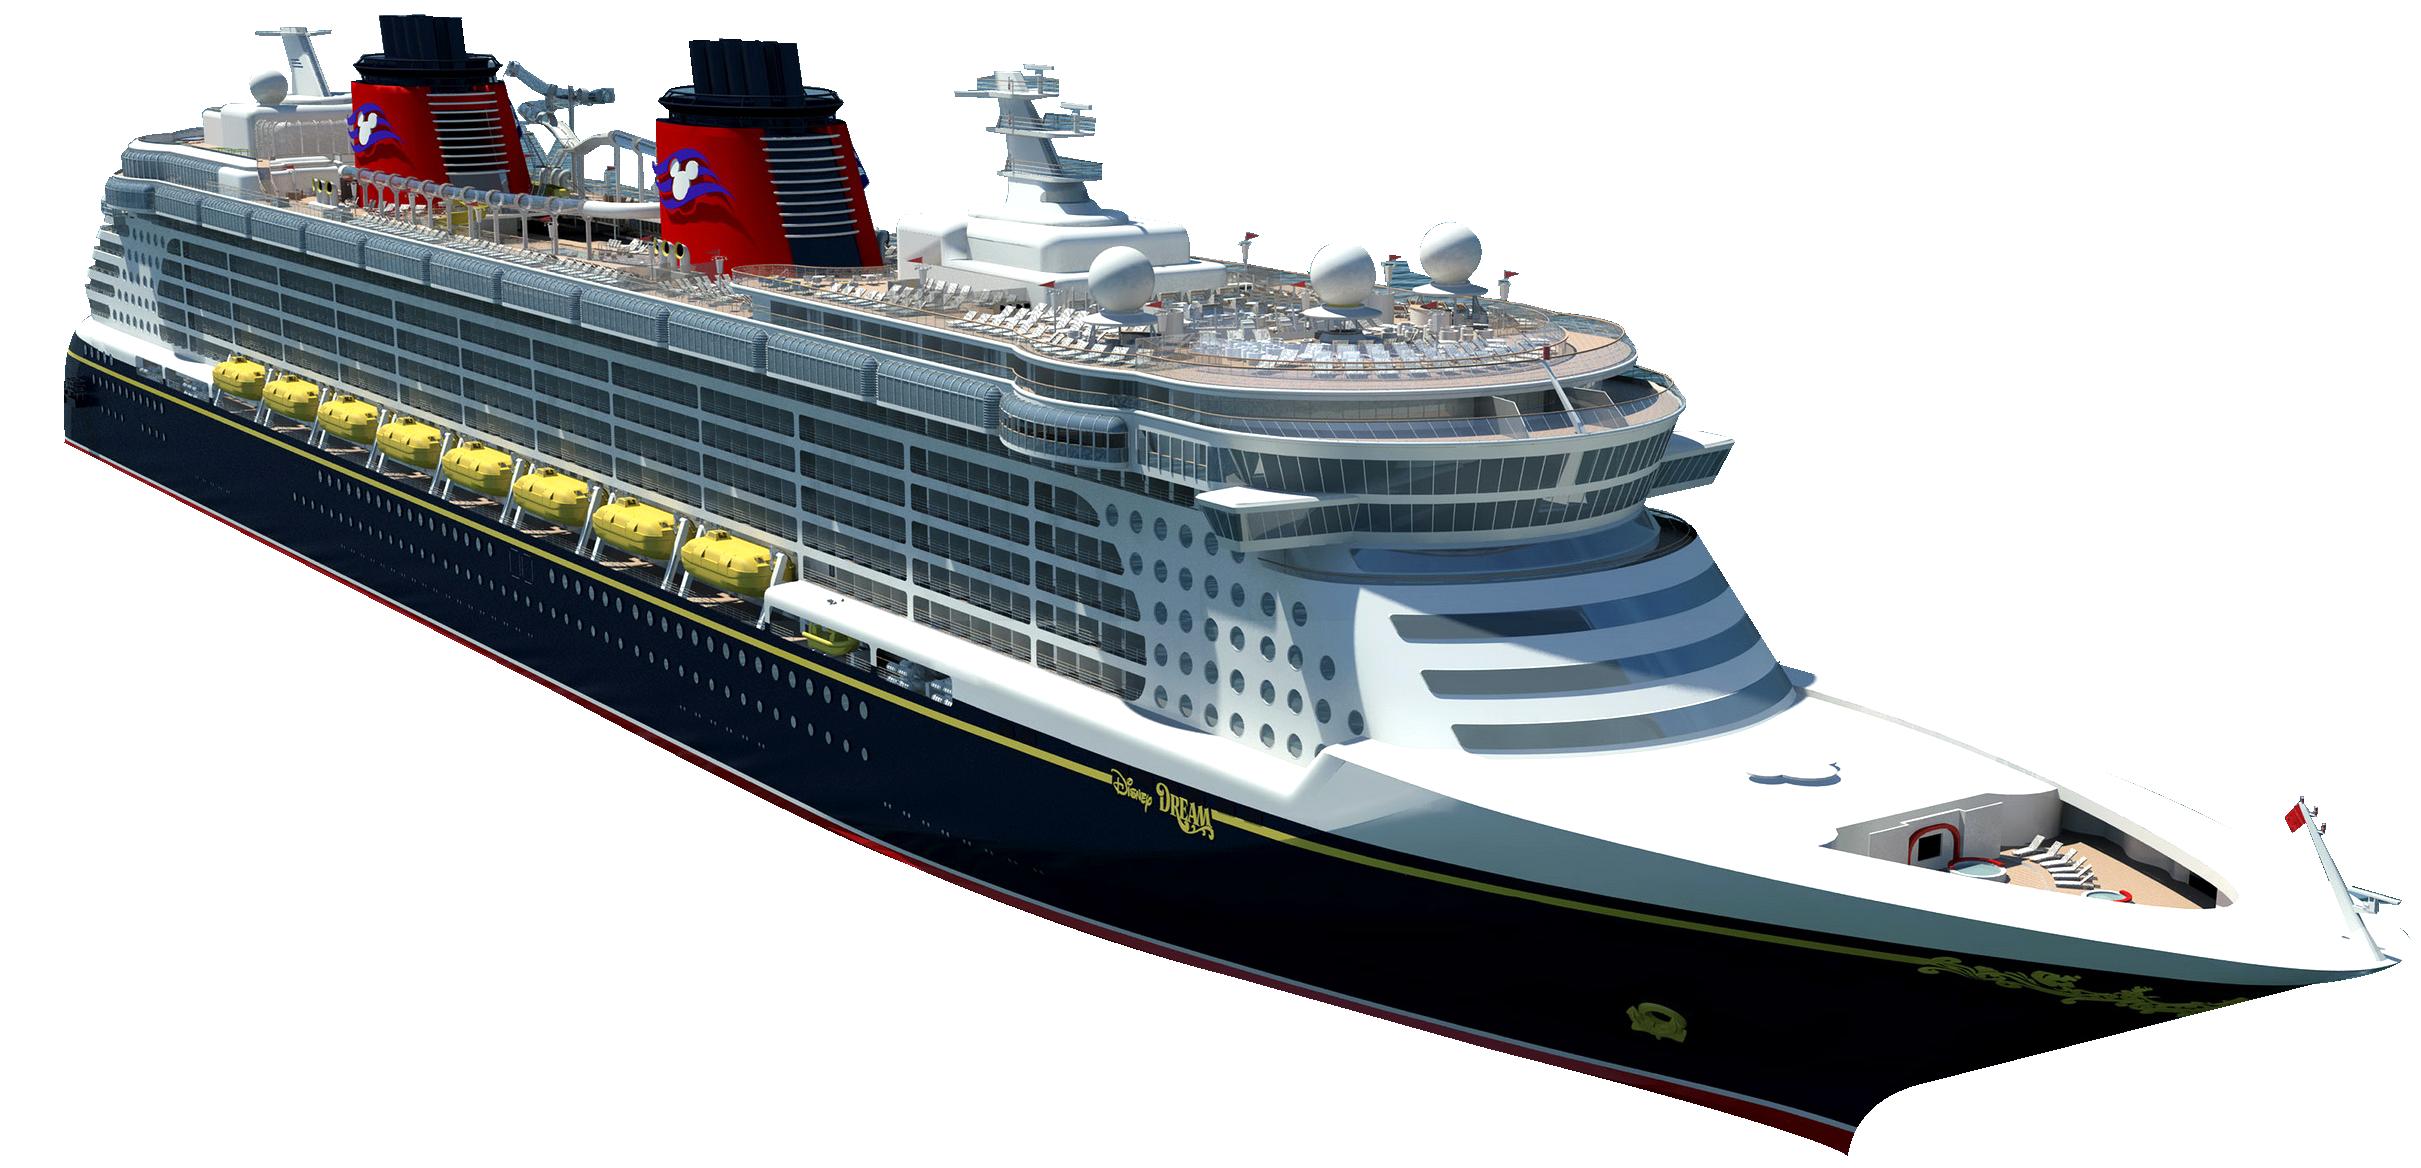 Cruise Ship PNG Image